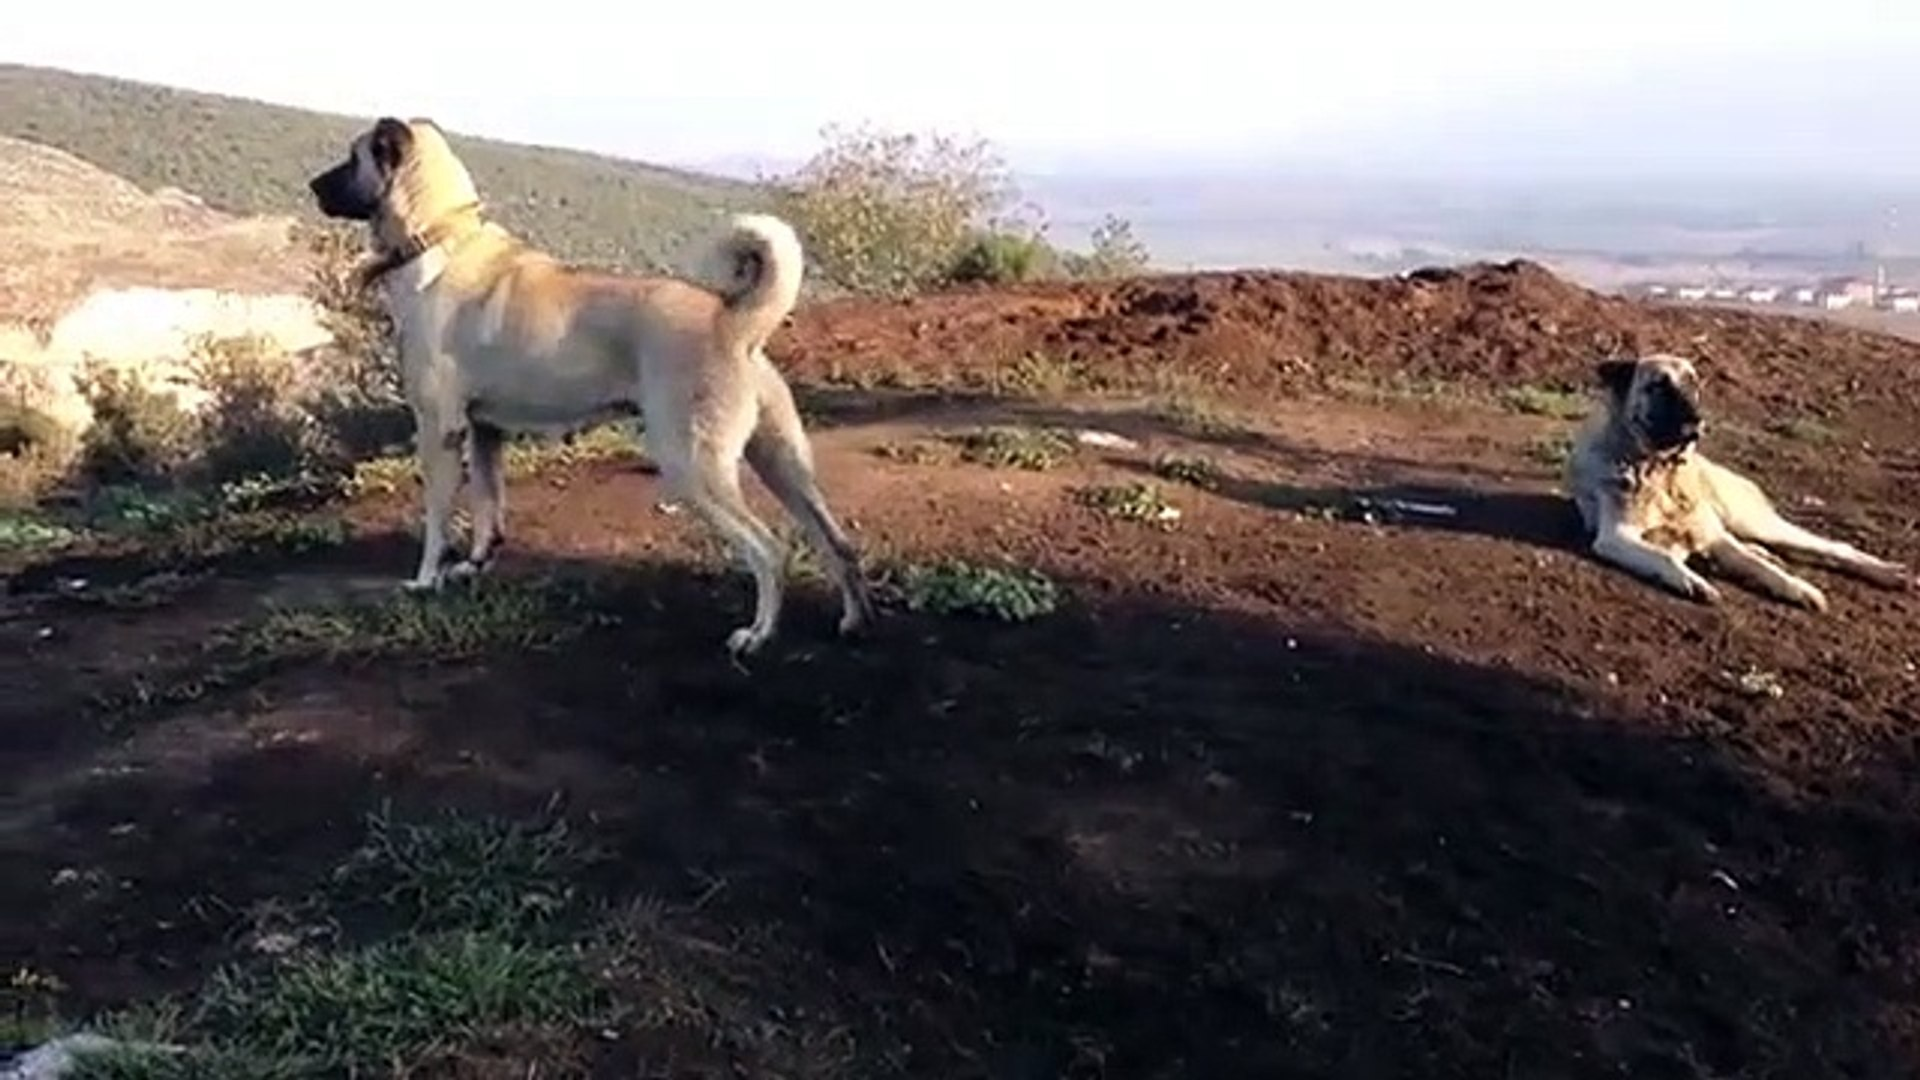 KANGAL KOPEGi HEP HAZIR - KANGAL SHEPHERD DOG